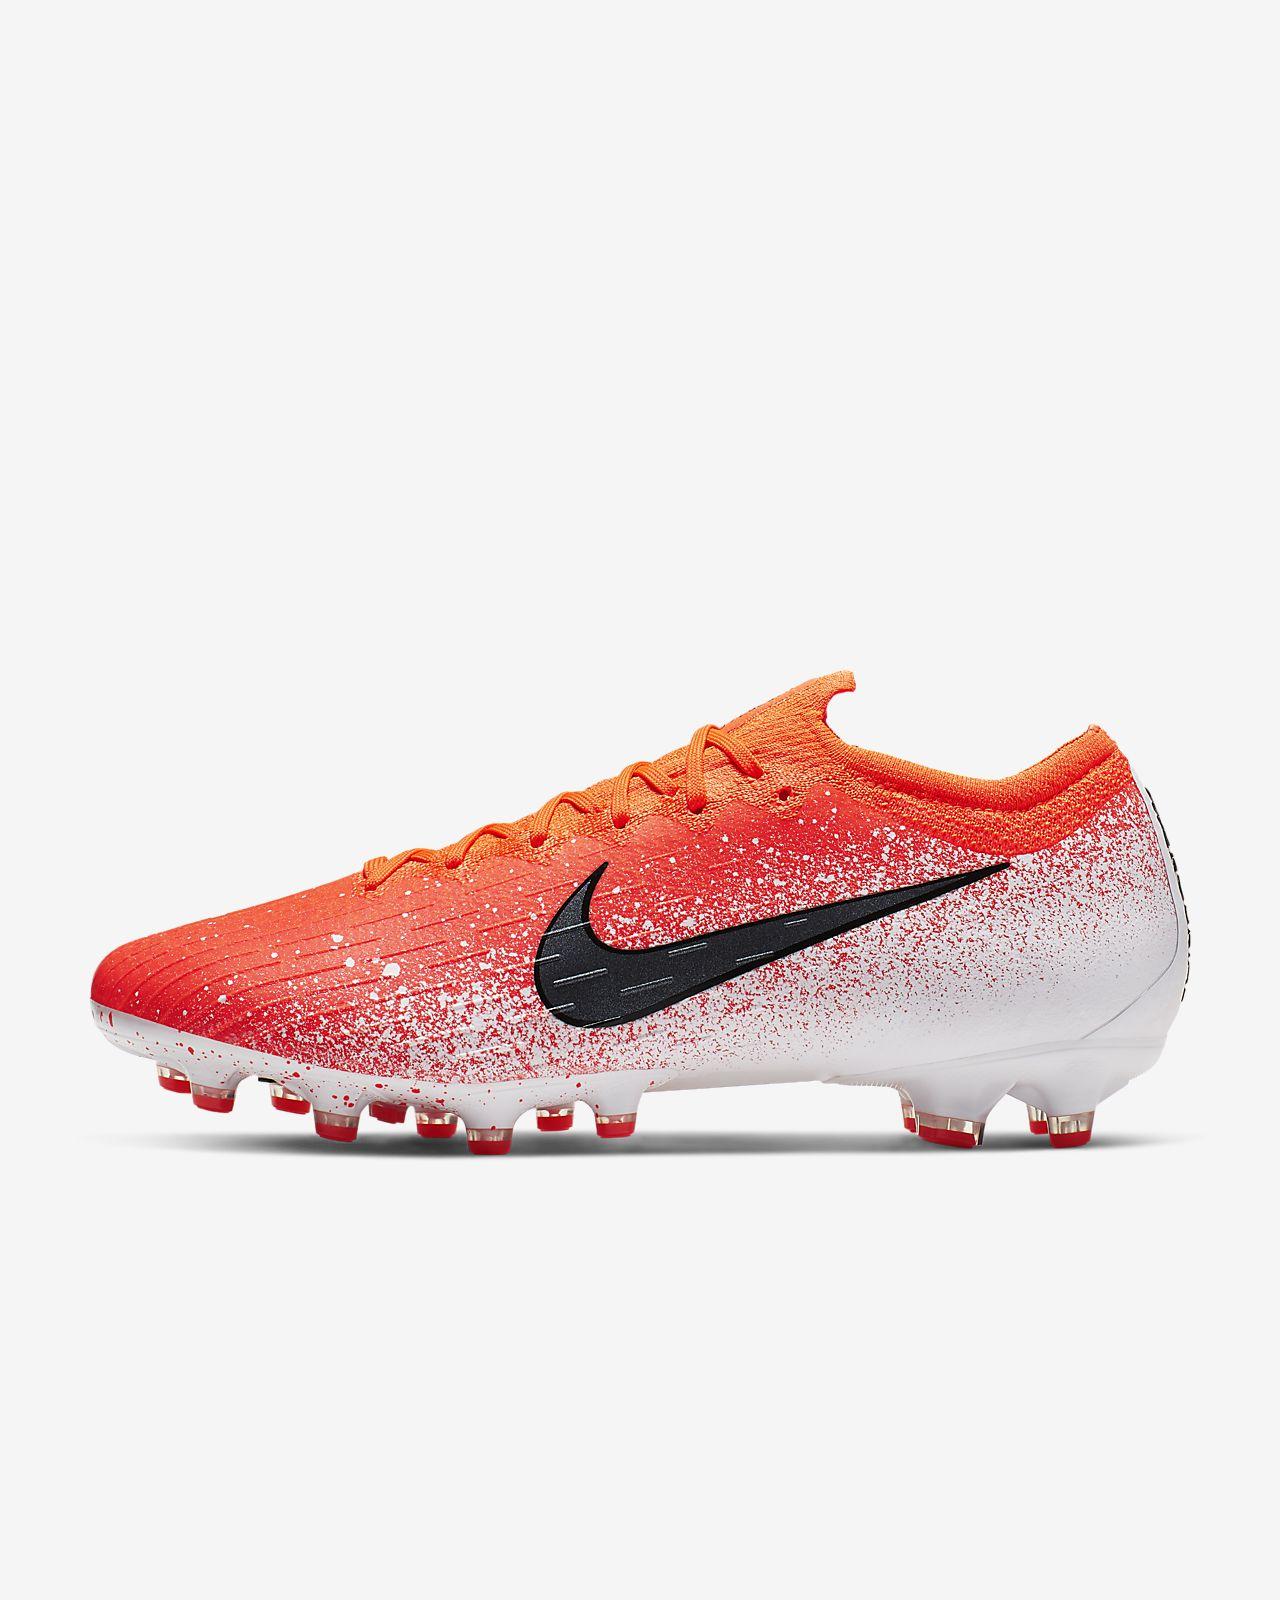 Scarpa da calcio per erba artificiale Nike Mercurial Vapor 360 Elite AG-PRO